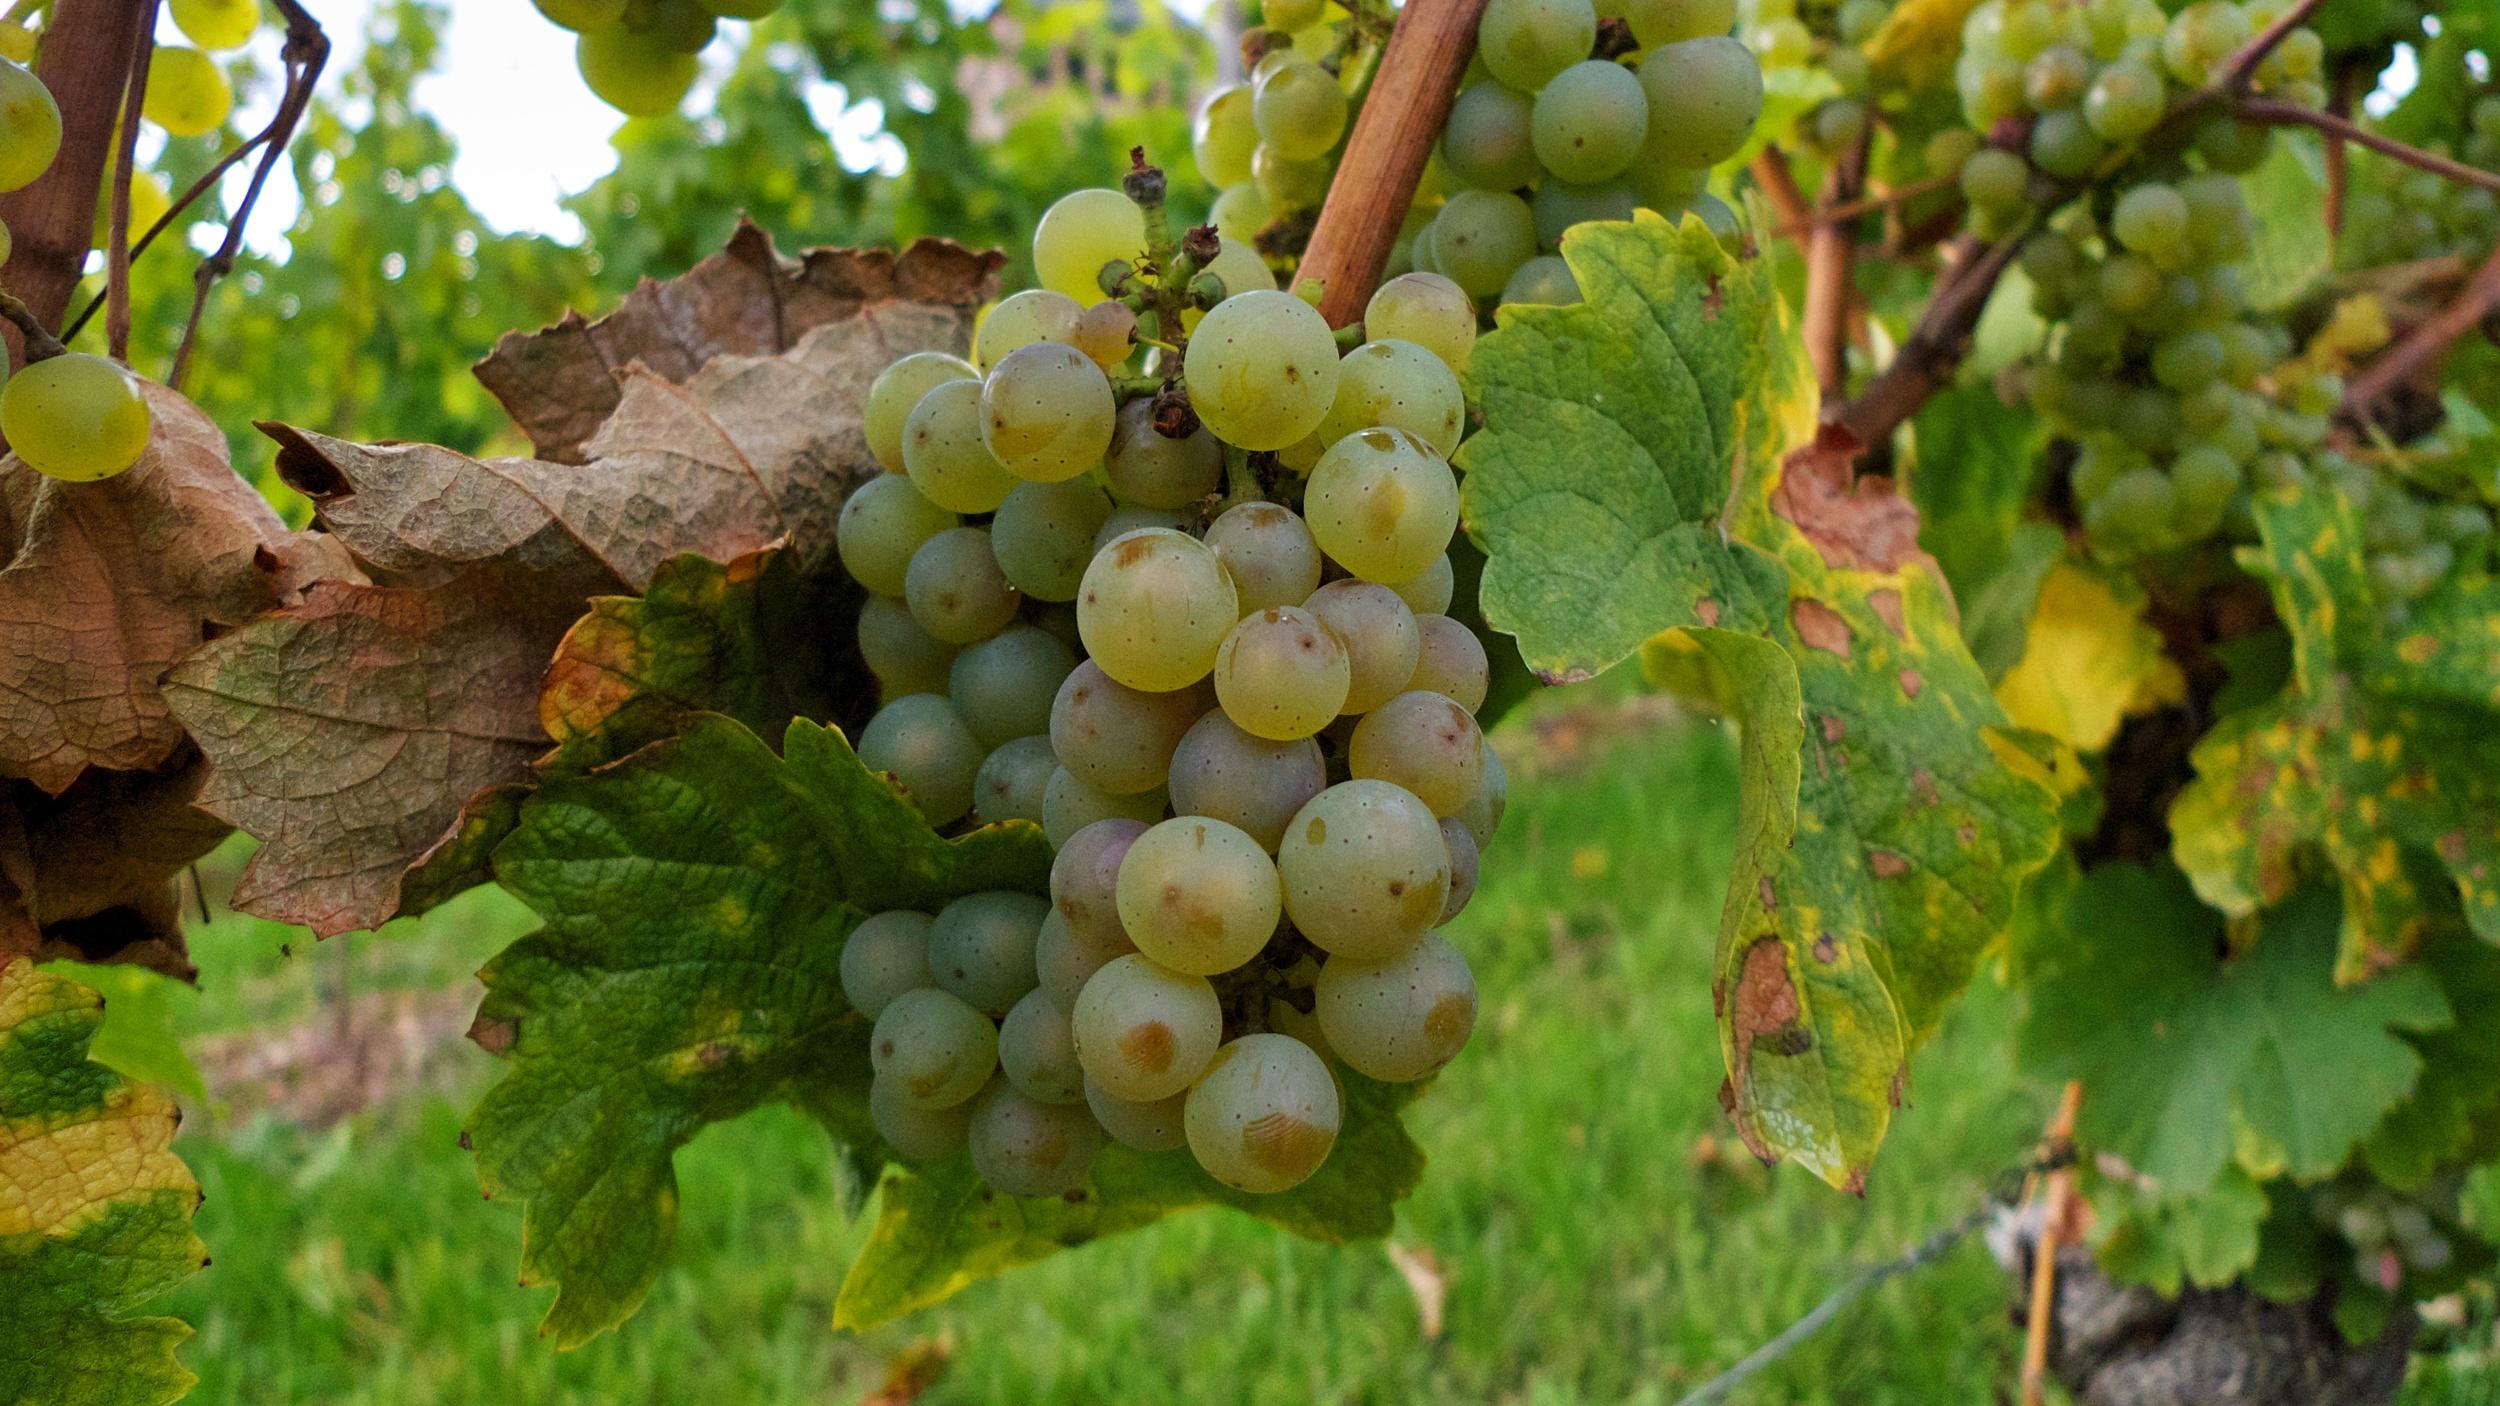 More Johannisberg wine